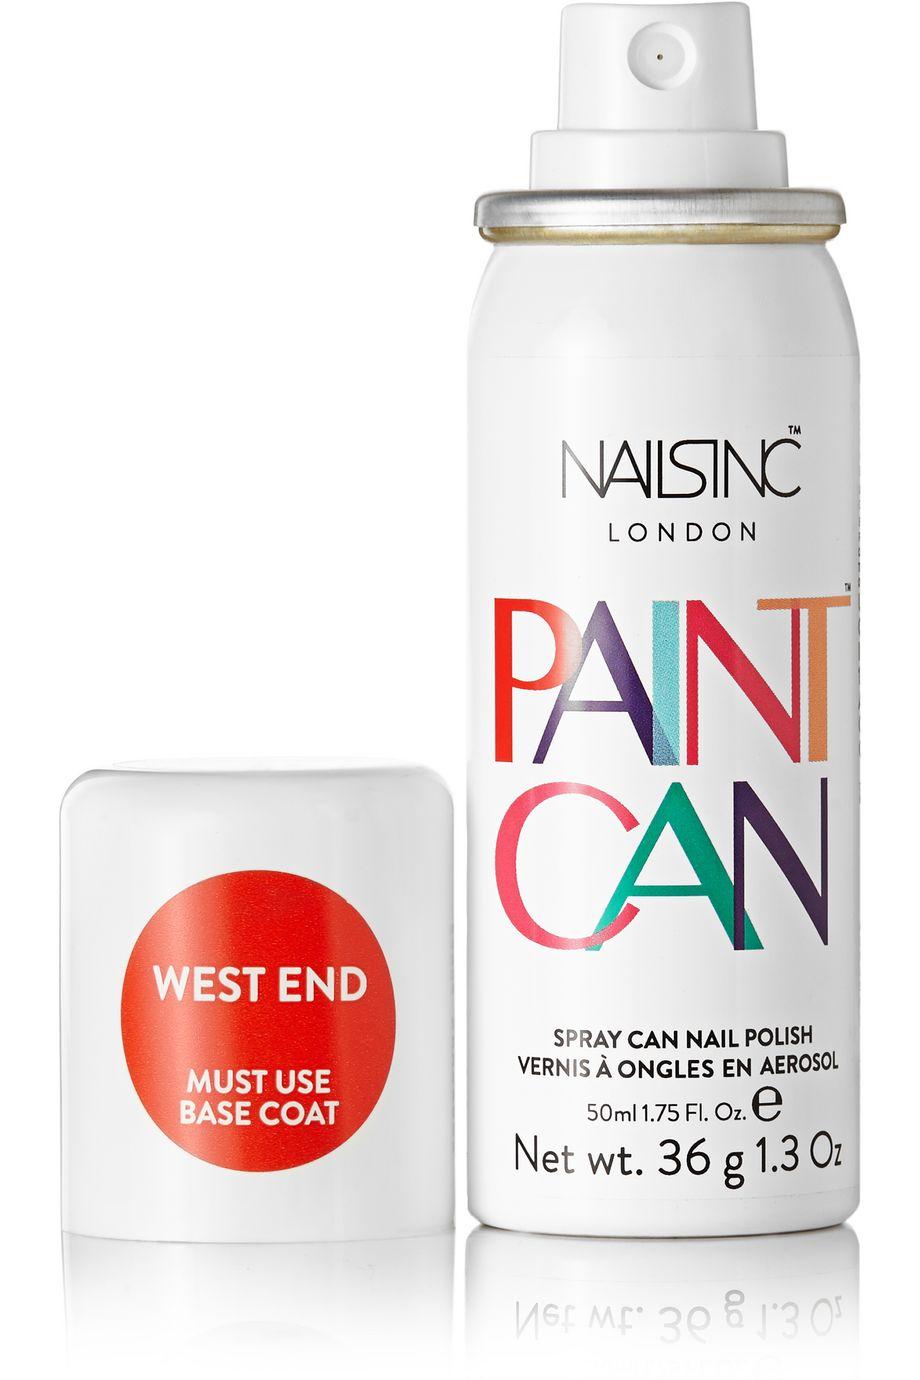 Nails inc Spray Can Nail Polish - West End, 50ml